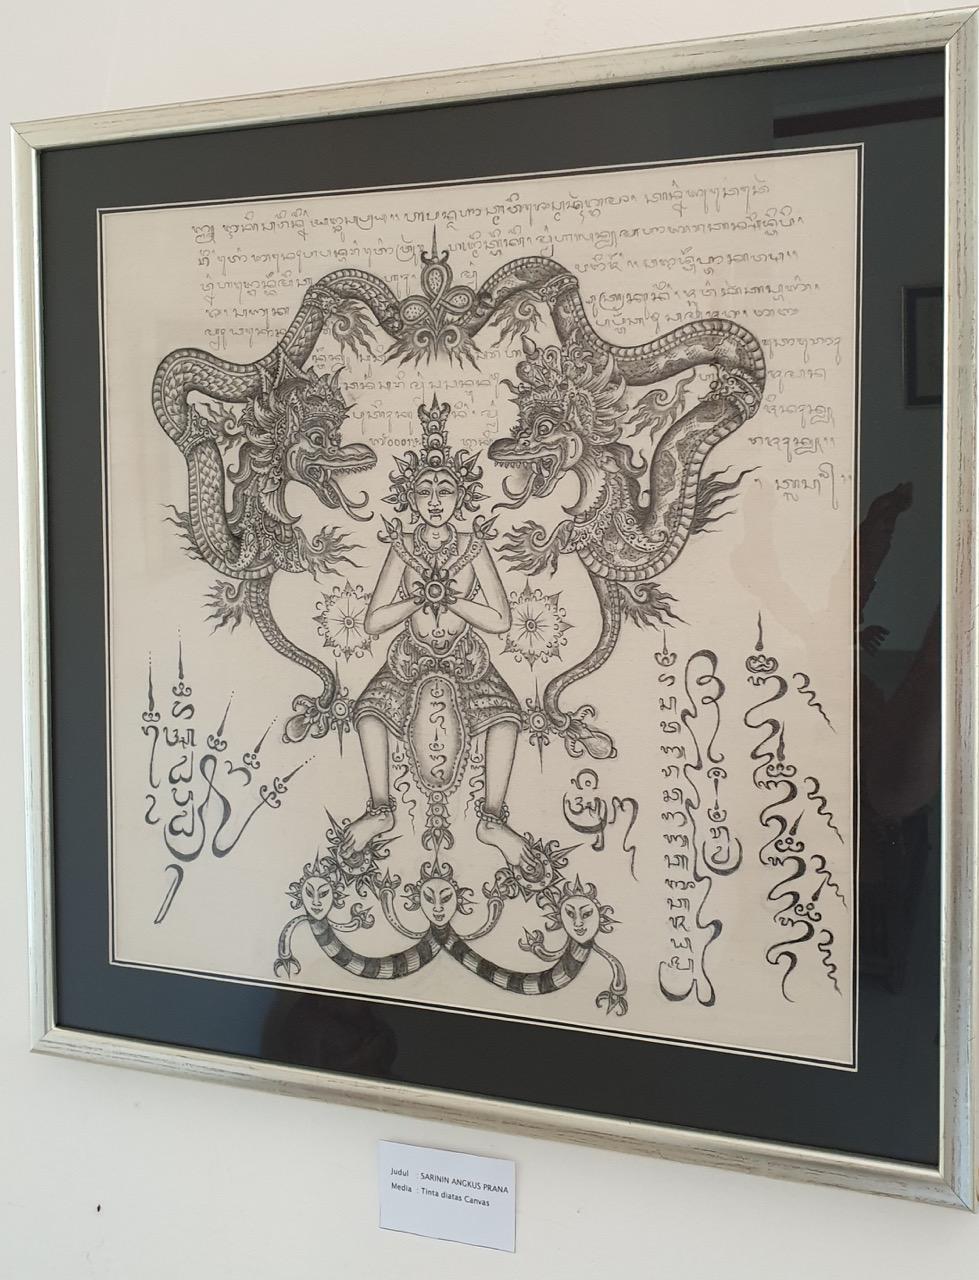 """Sarinin Angkus Prana"" by Jro Mangku Badra exhibited at ARMA in ""Frequency Balinese Art, Culture and Rerajahan"" Image Richard Horstman"